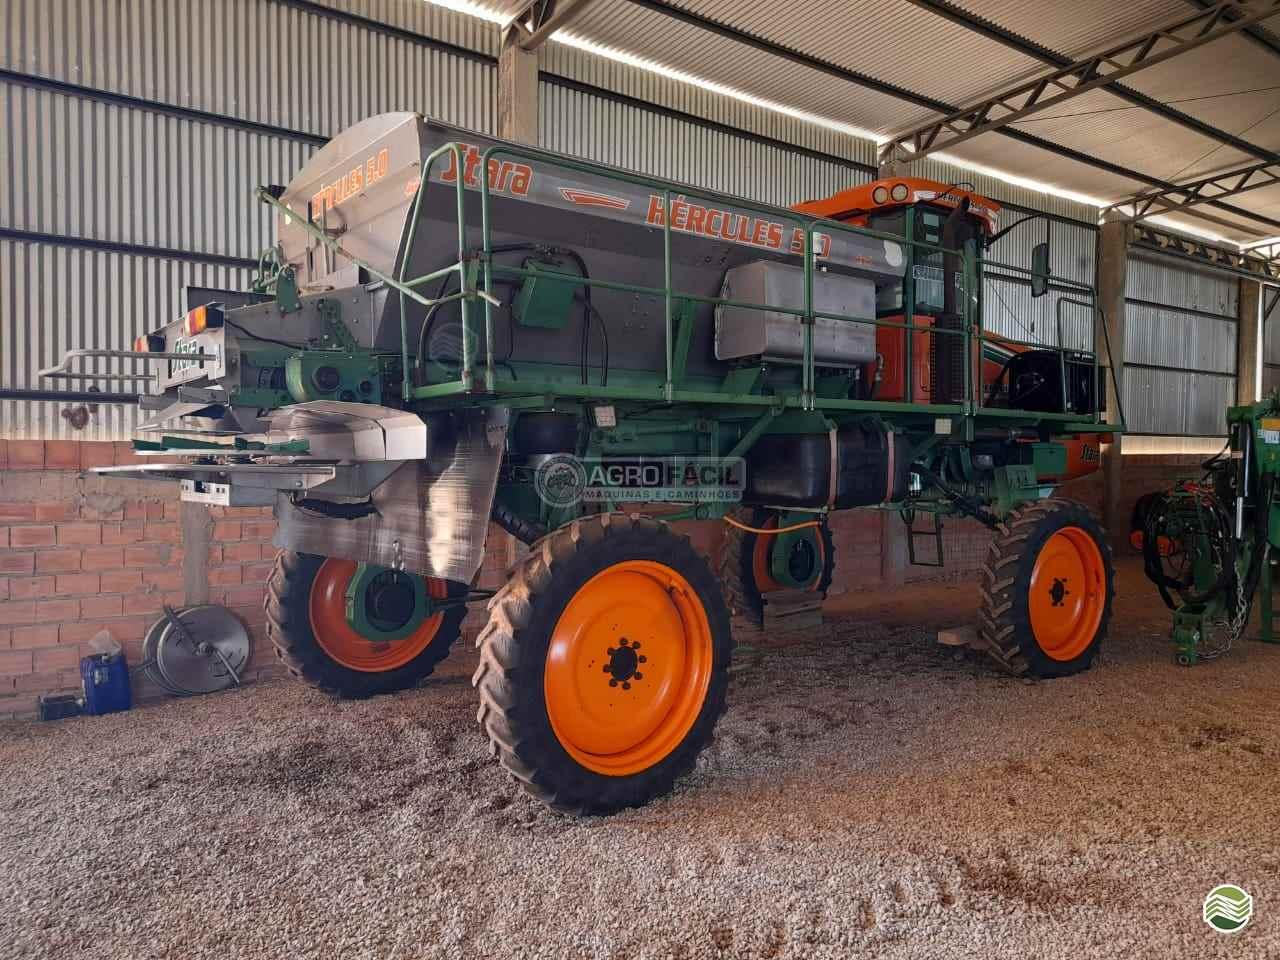 HERCULES 5.0 de Agro Fácil Máquinas - PRIMAVERA DO LESTE/MT